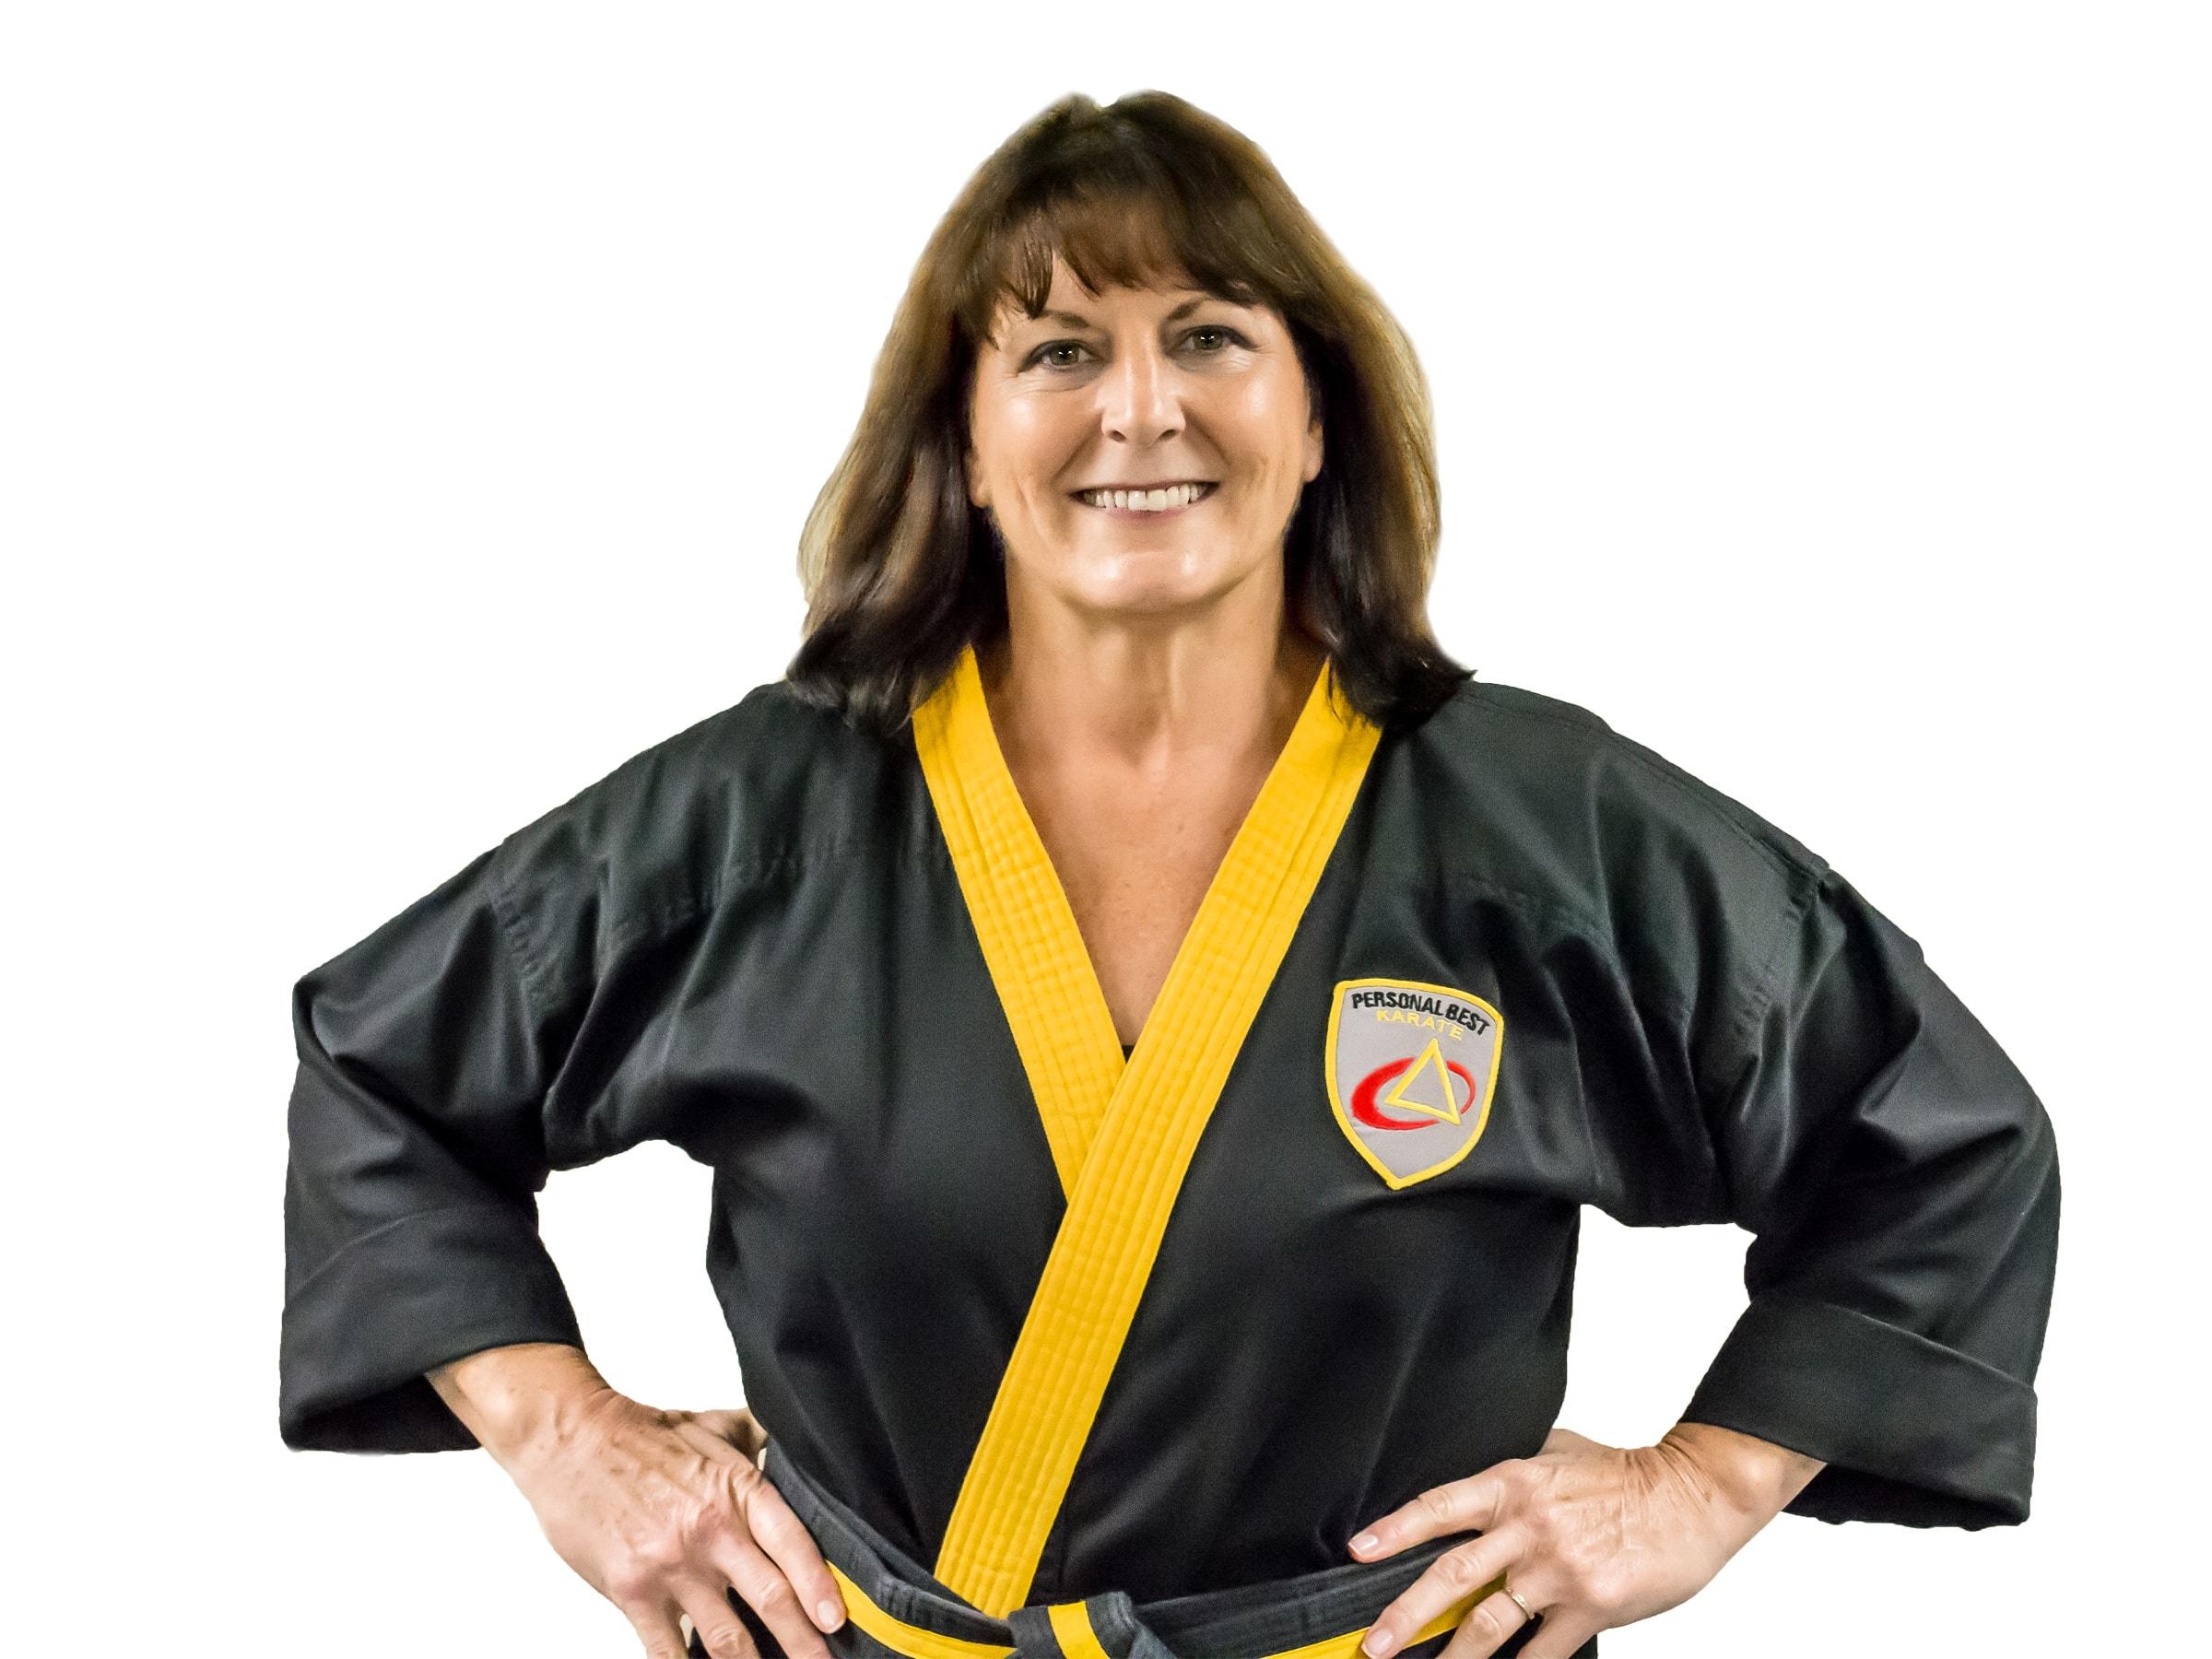 Eileen Rappold in Norton - Personal Best Karate